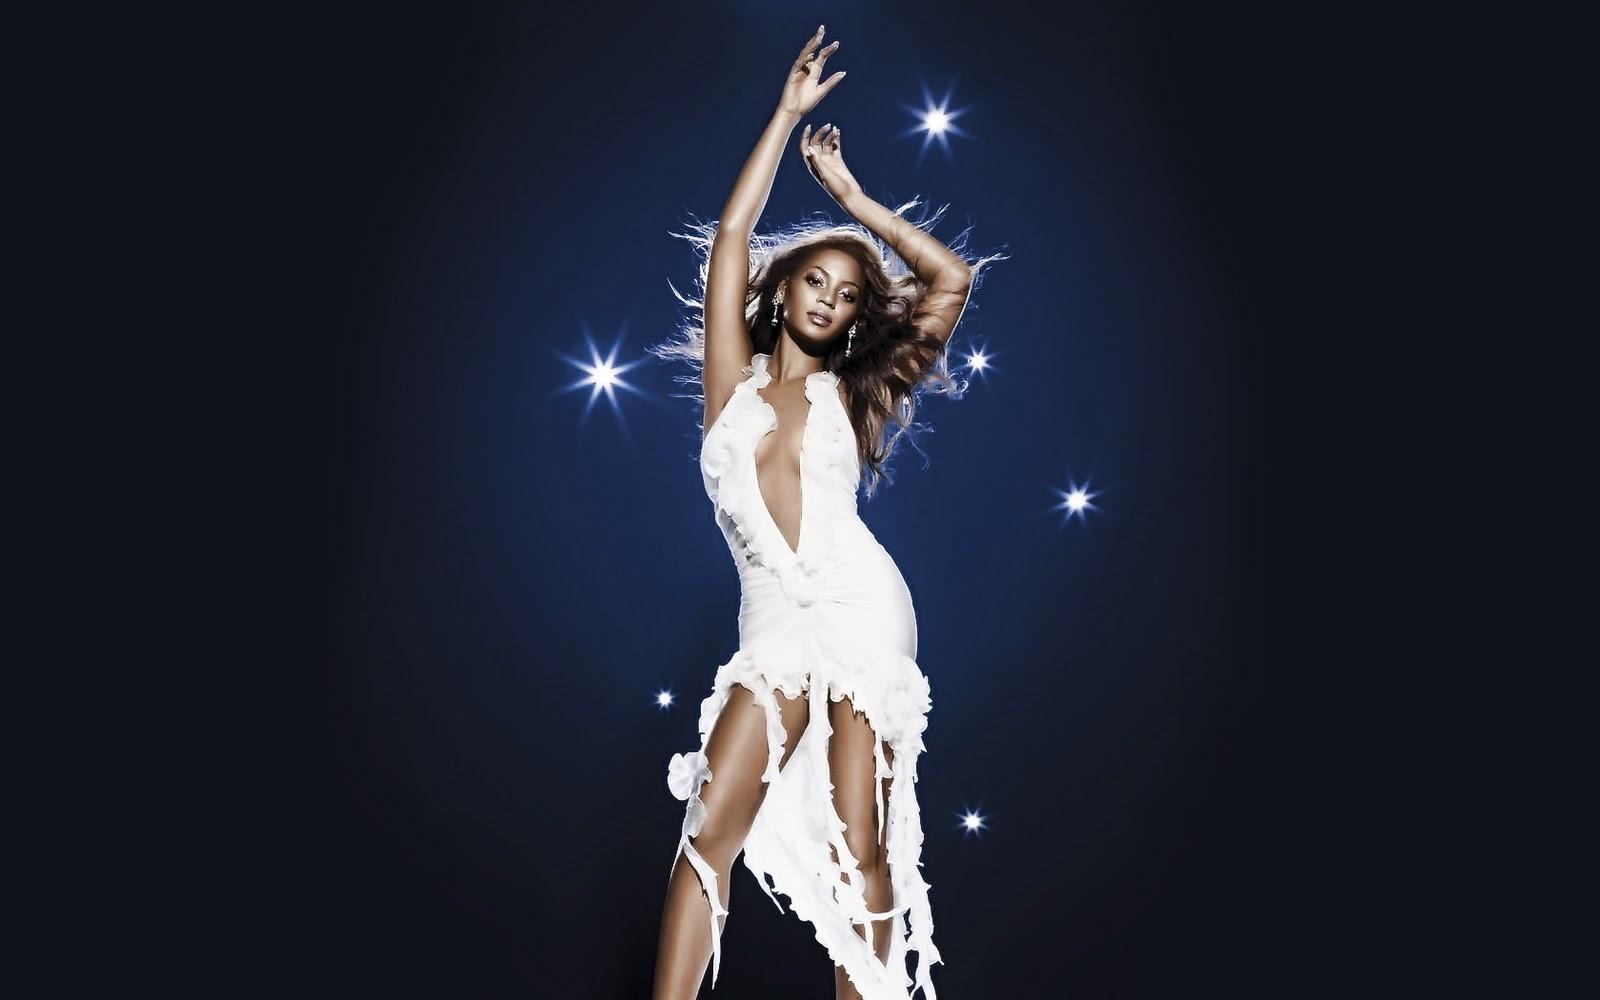 http://4.bp.blogspot.com/__A8FDKqD8-Q/TNrZM1ylK_I/AAAAAAAAAEE/Rg36Rql_tVE/s1600/Beyonce%25C2%25A6%25C3%25BCStars.jpg